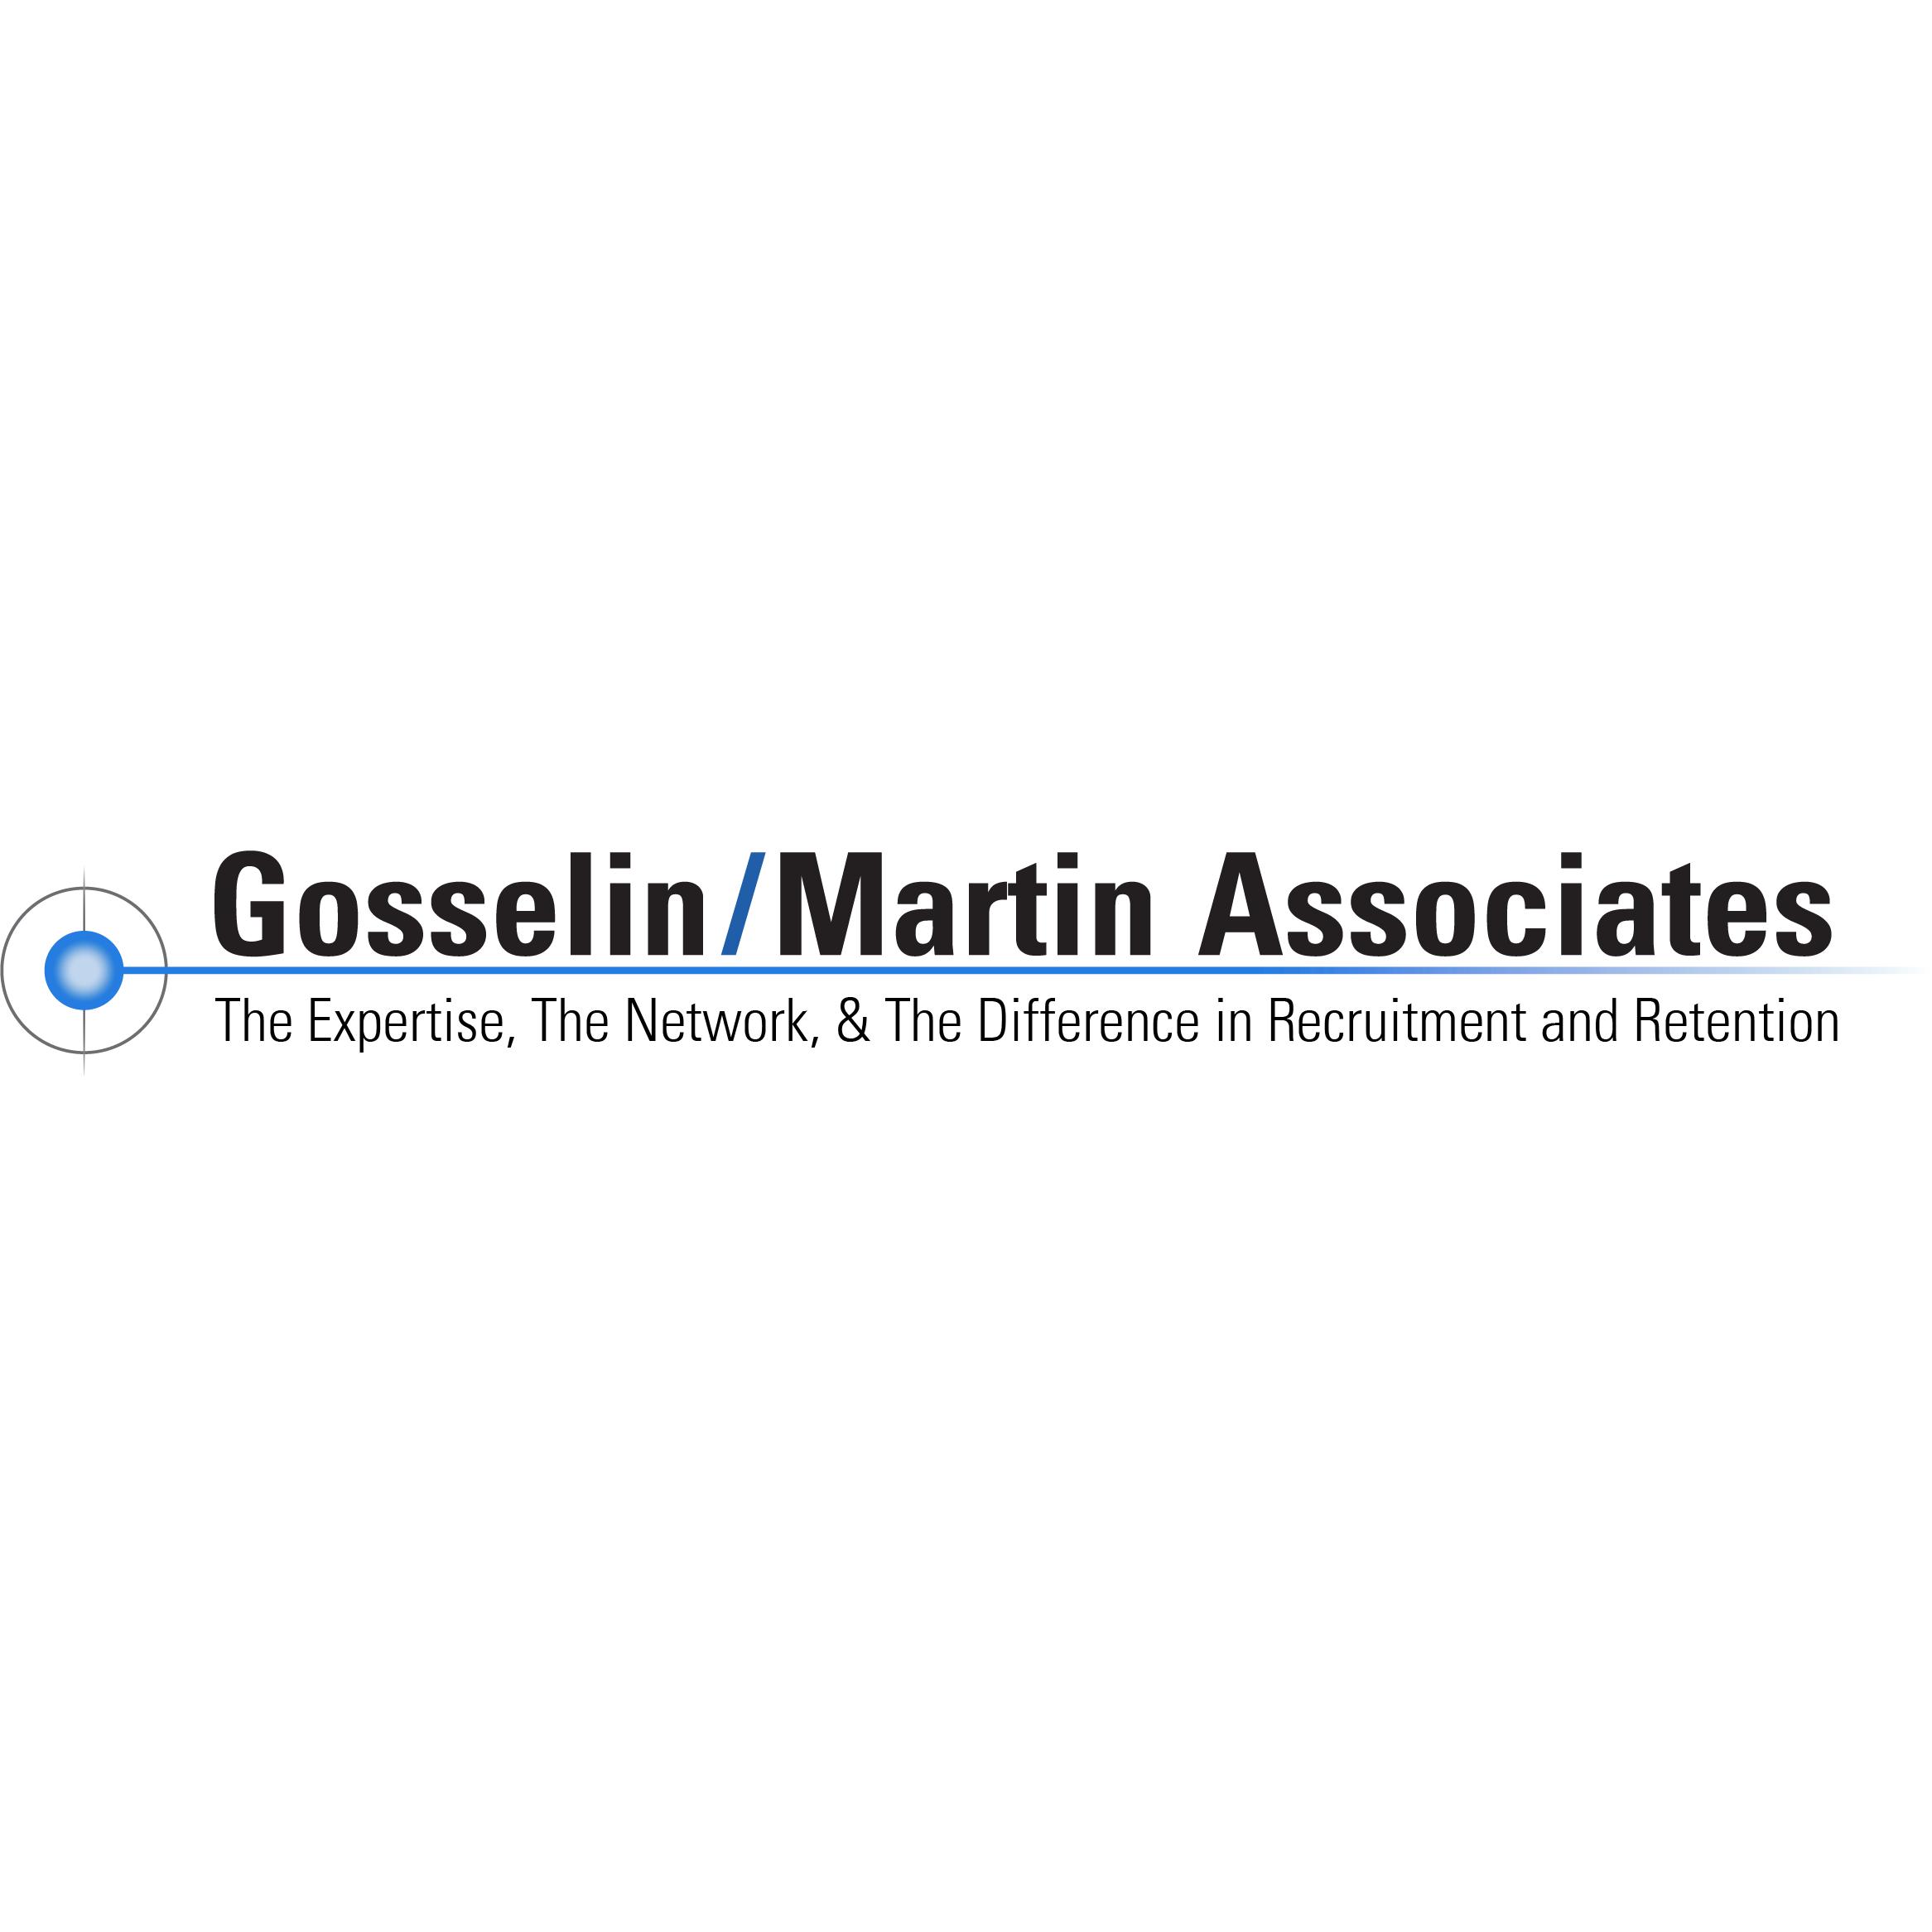 Gosselin/Martin Associates image 0